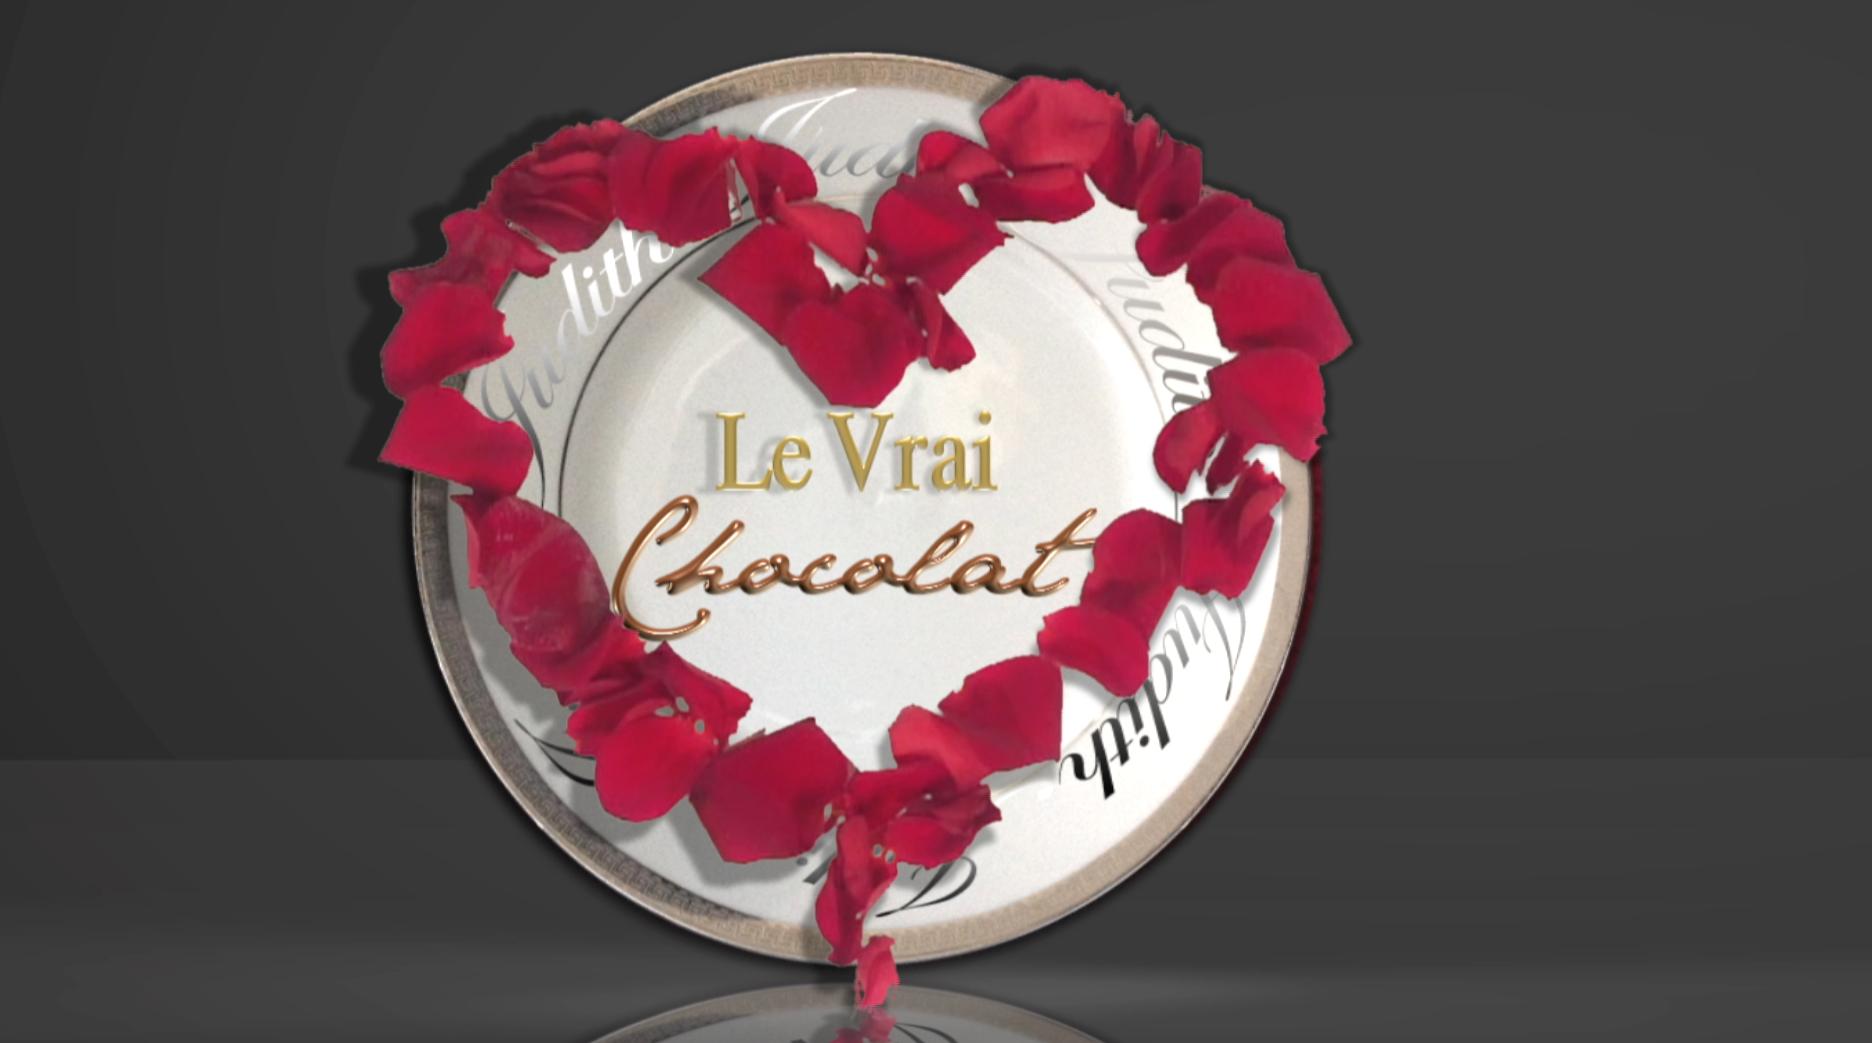 Le vrai chocolat.png